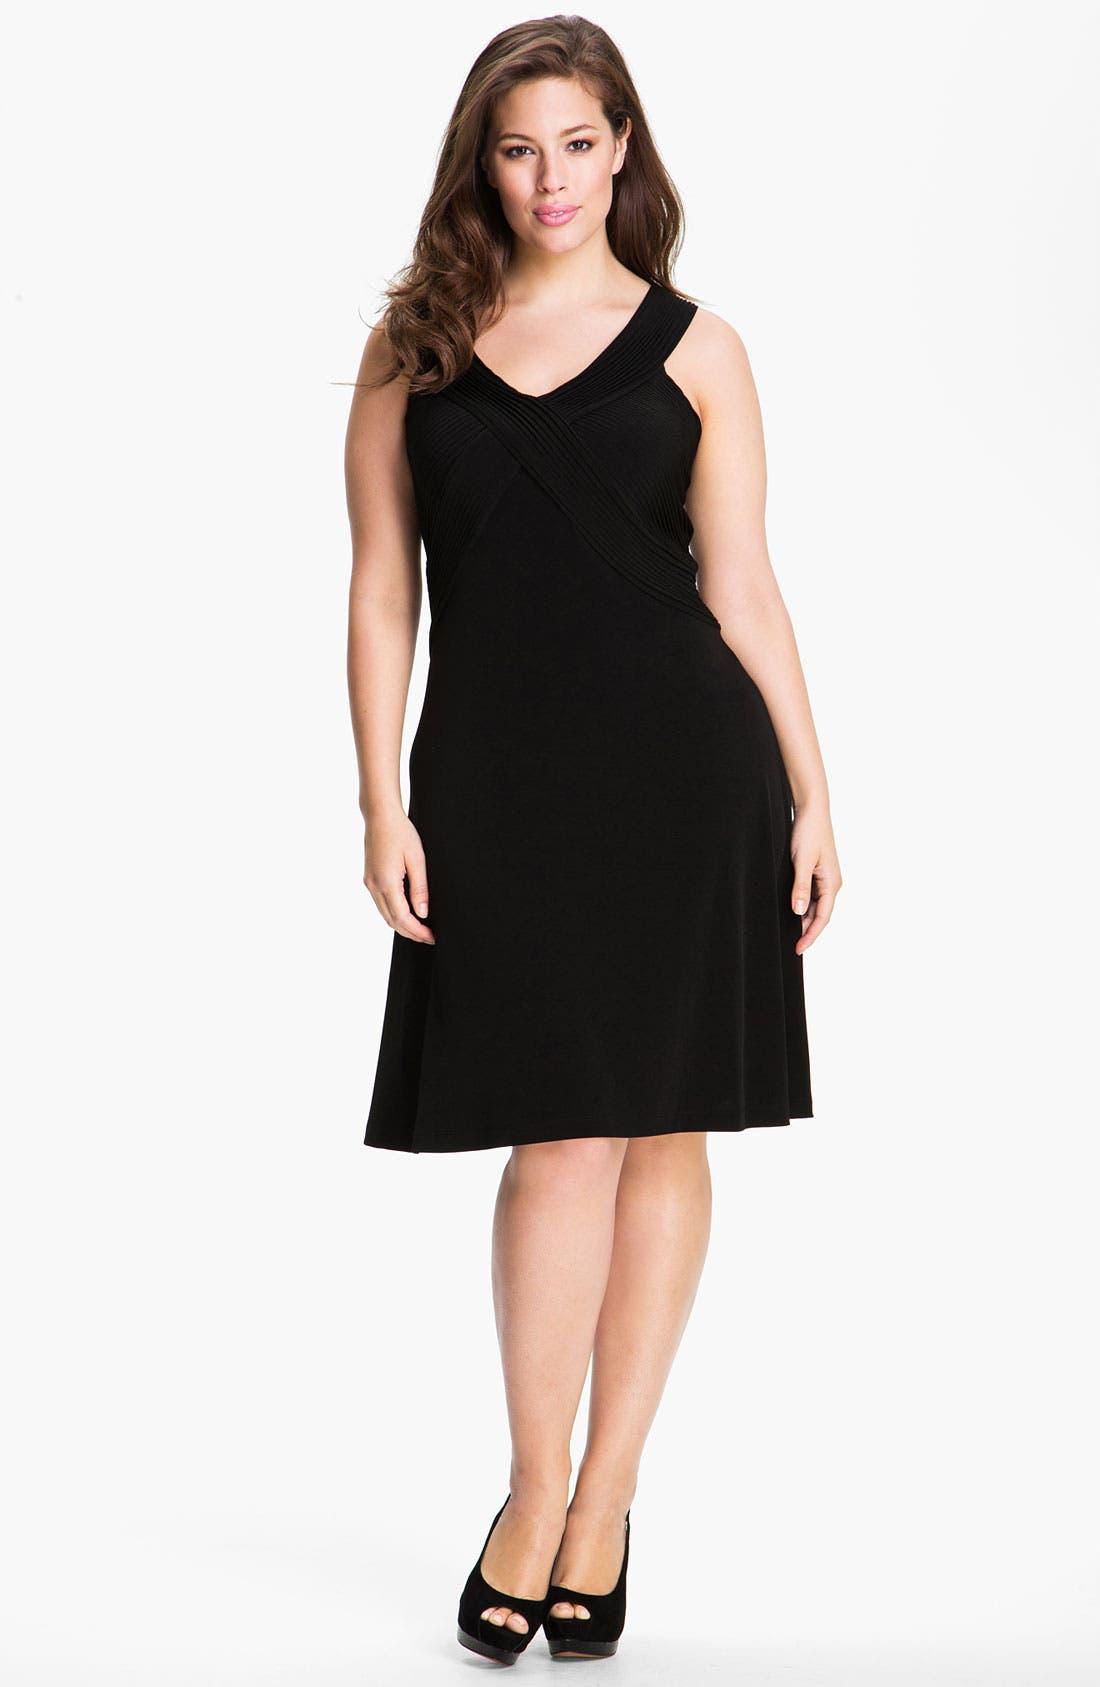 Main Image - Calvin Klein Crisscross Sleeveless Knit Dress (Plus)